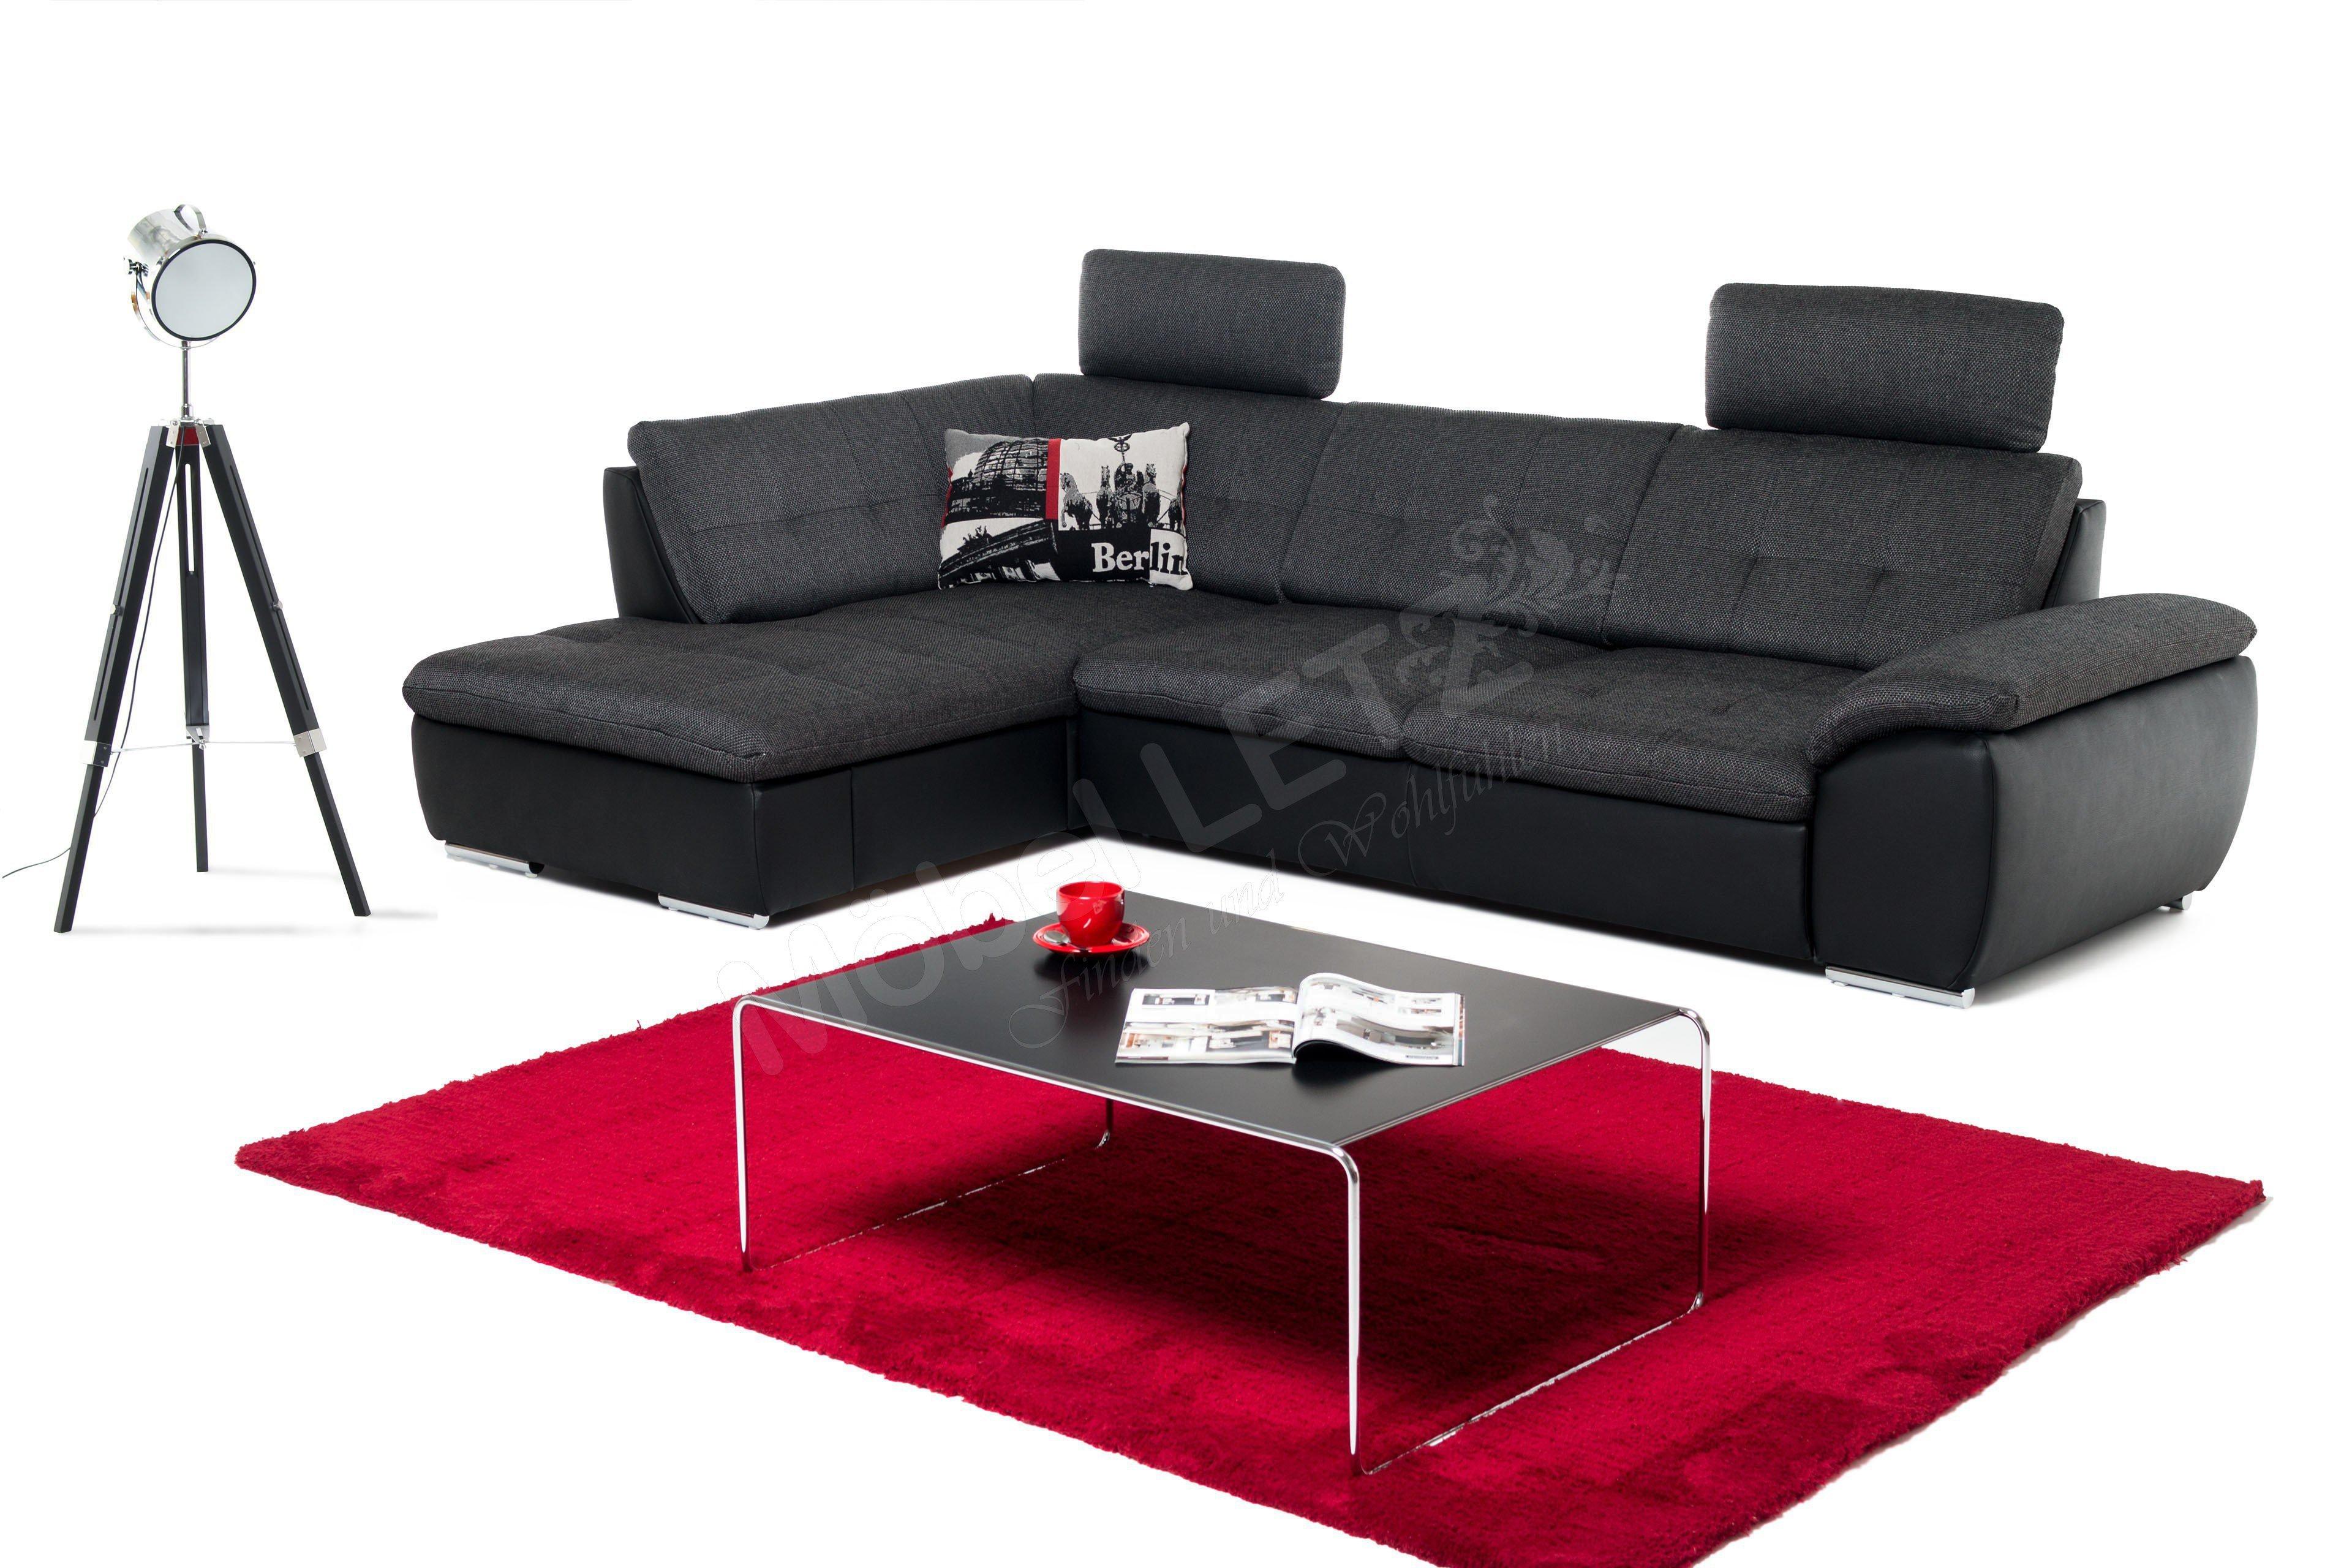 megapol polsterm bel ecksofa in anthrazit schwarz m bel letz ihr online shop. Black Bedroom Furniture Sets. Home Design Ideas